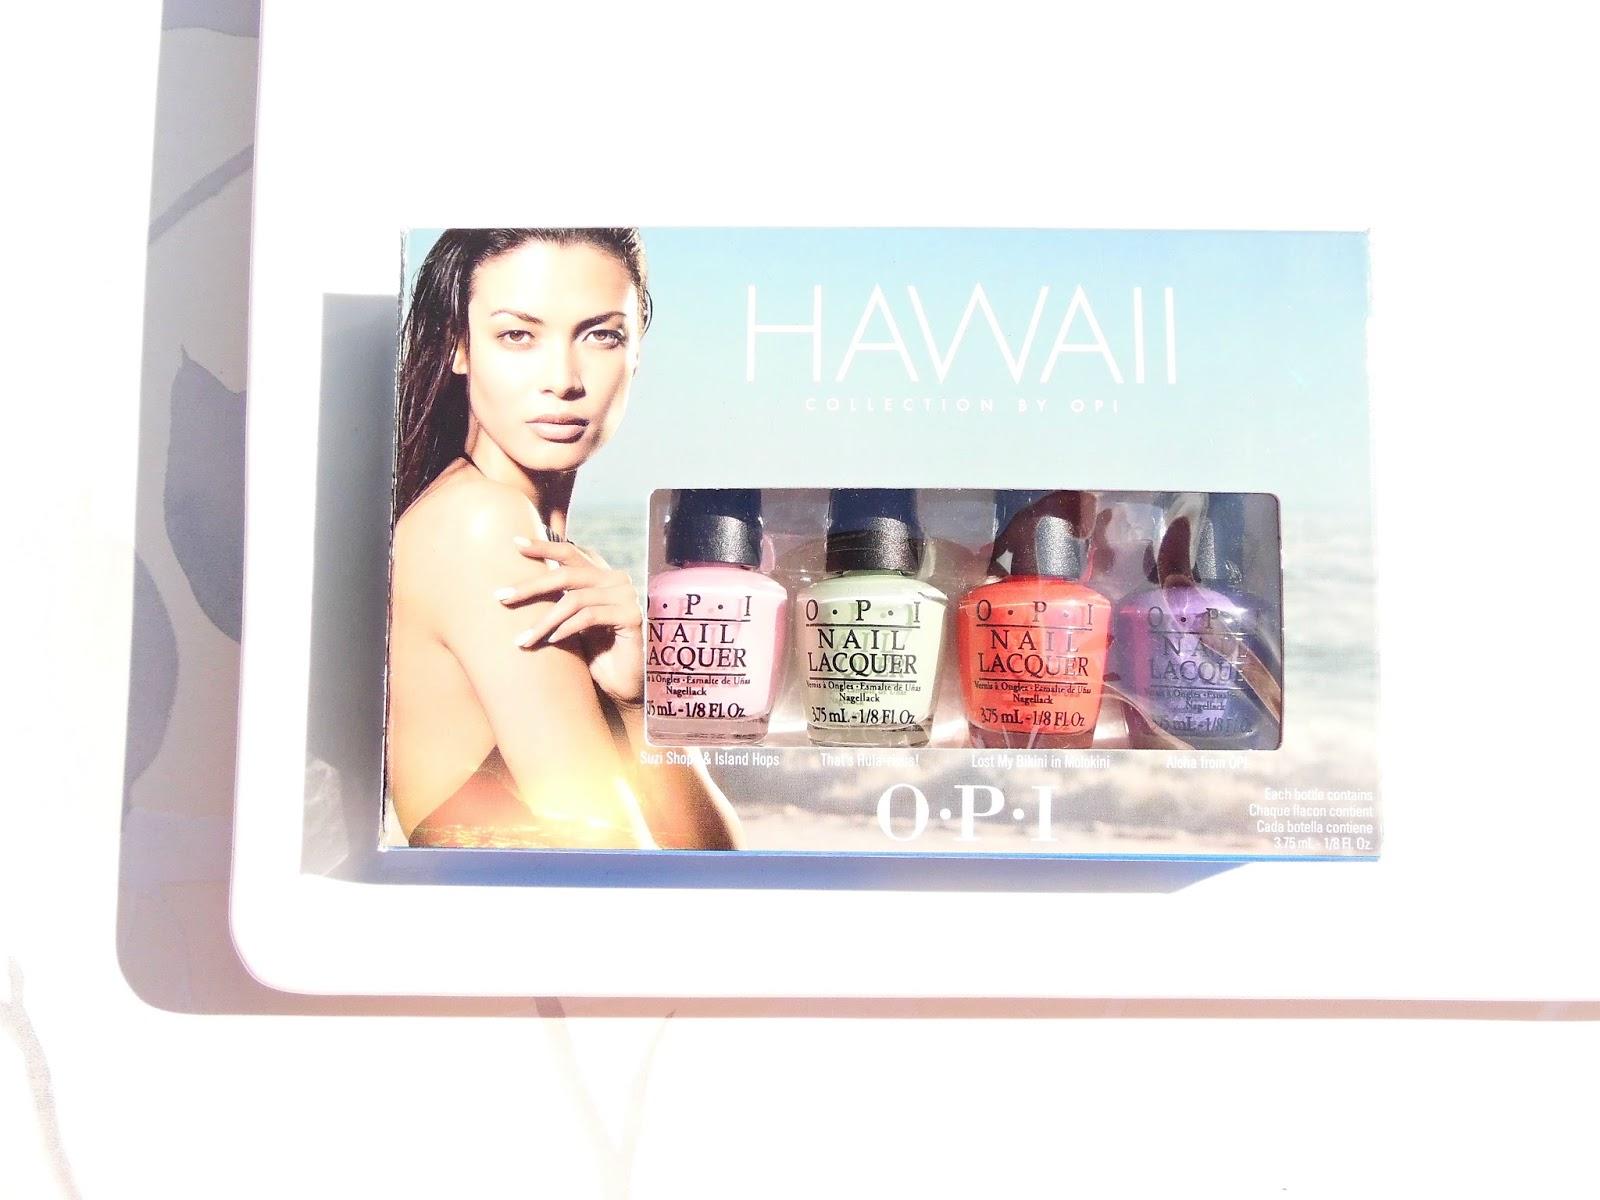 OPI Hawaii Little Hulas Mini Pack